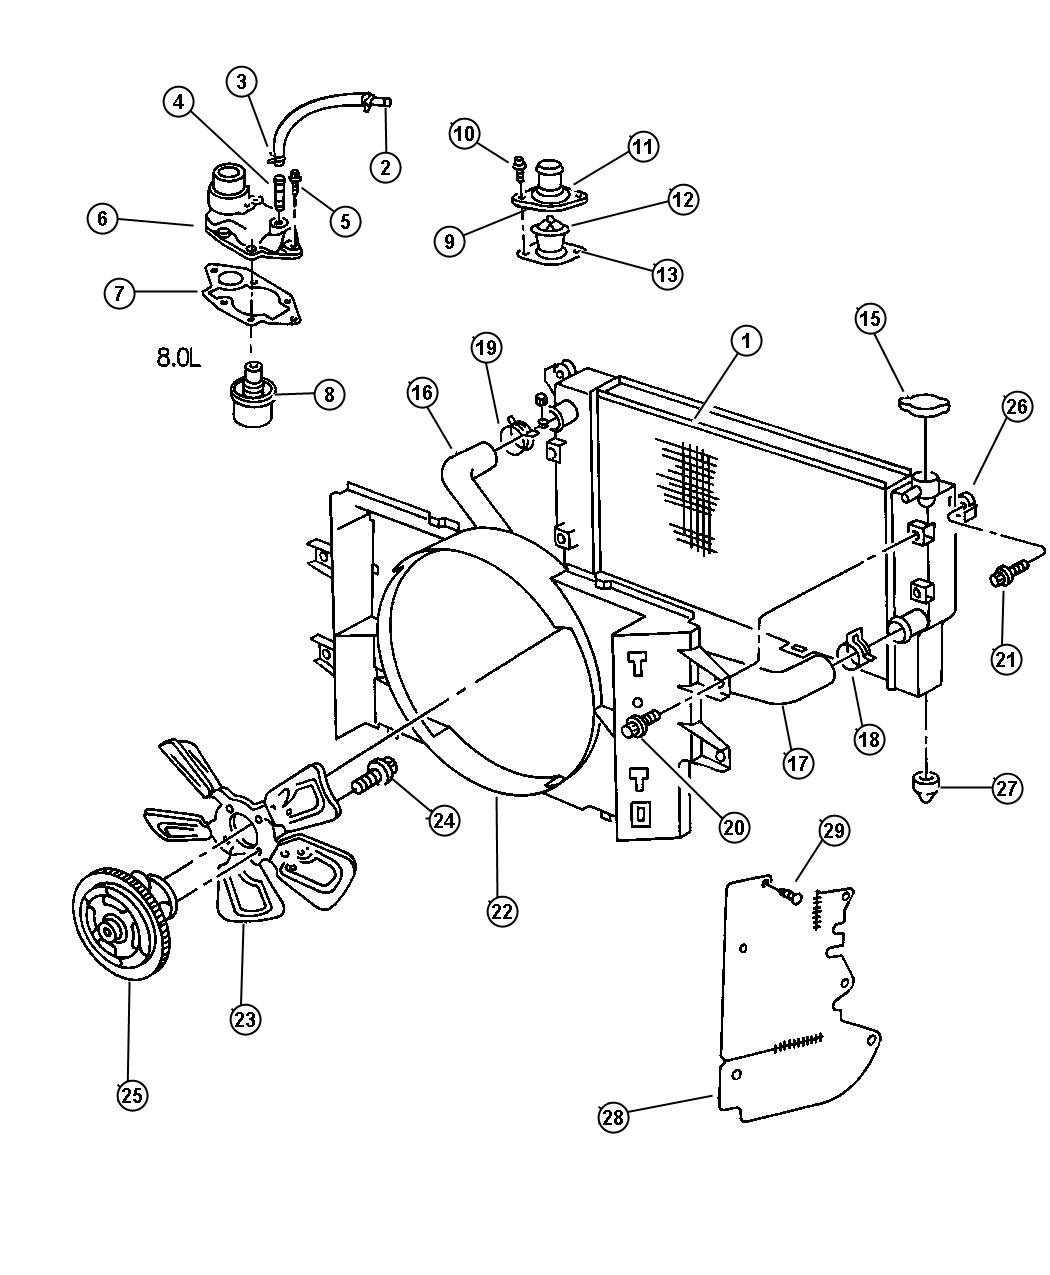 1997 Dodge Ram 1500 Engine Diagram 2002 Chevy Impala Radio Wiring Diagrams Pipiiing Layout Yenpancane Jeanjaures37 Fr